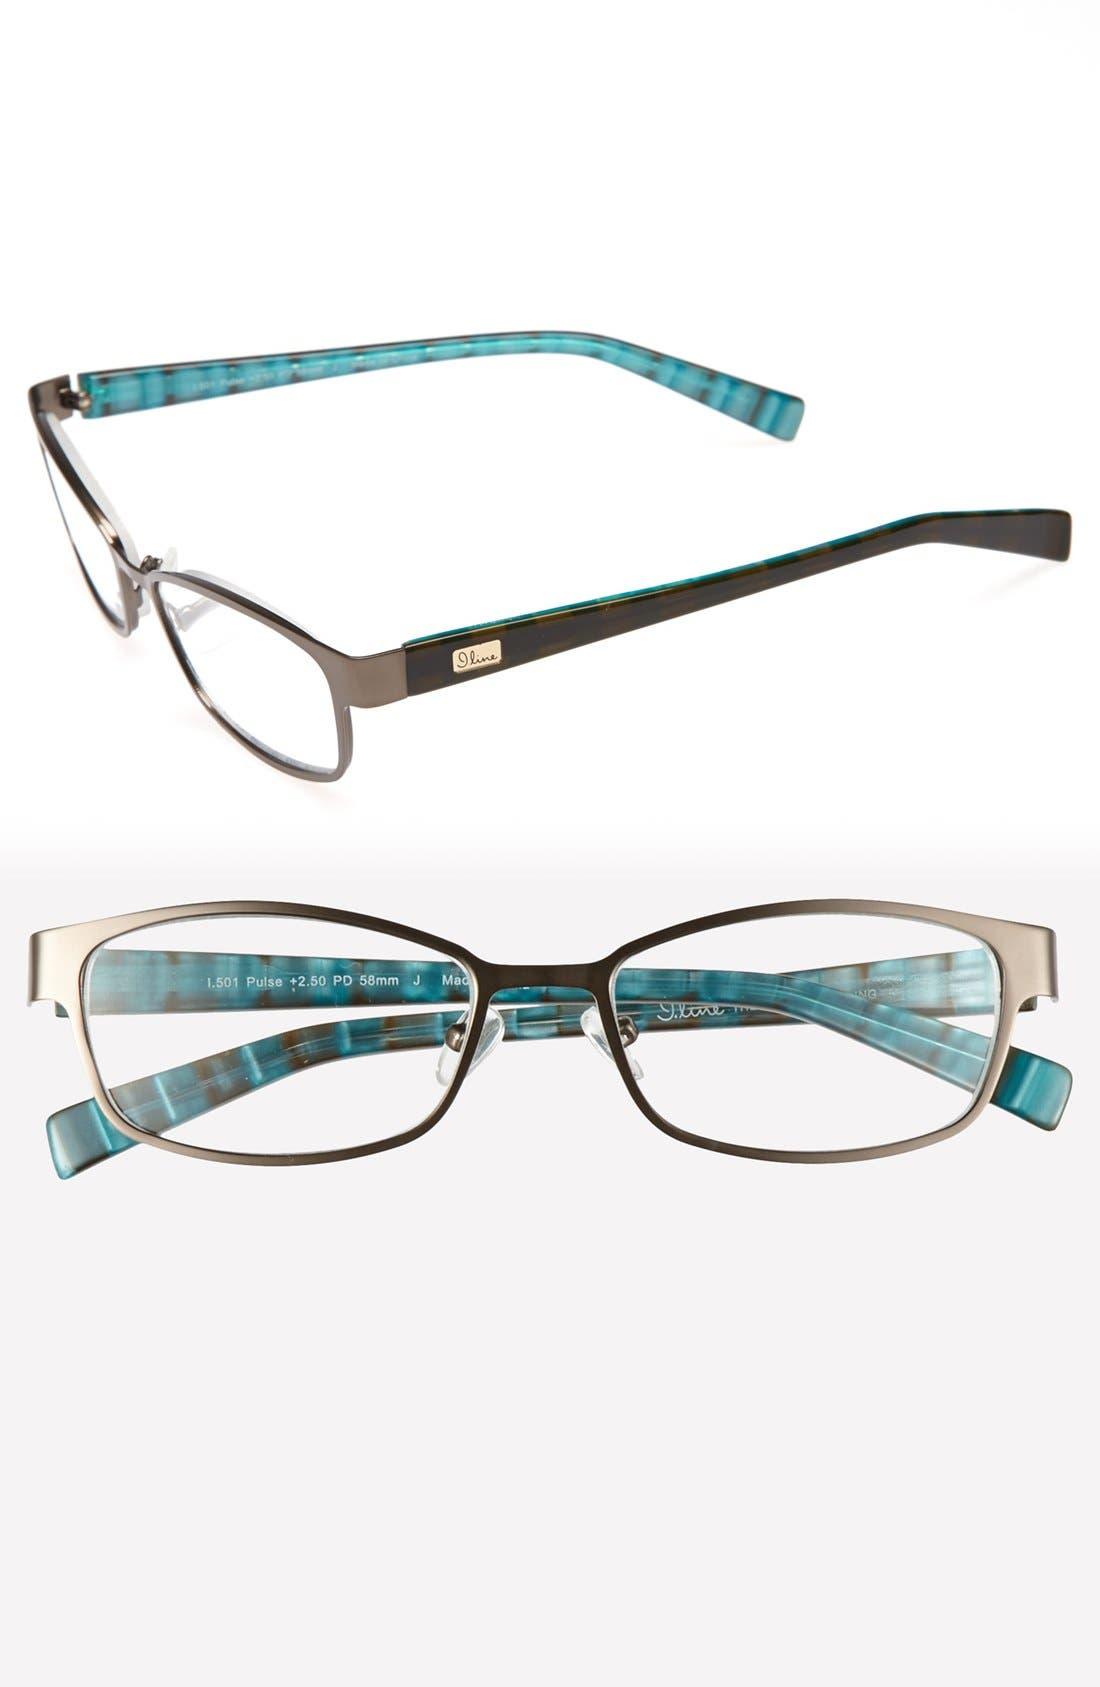 Alternate Image 1 Selected - I Line Eyewear 'Pulse' 52mm Reading Glasses (2 for $88)